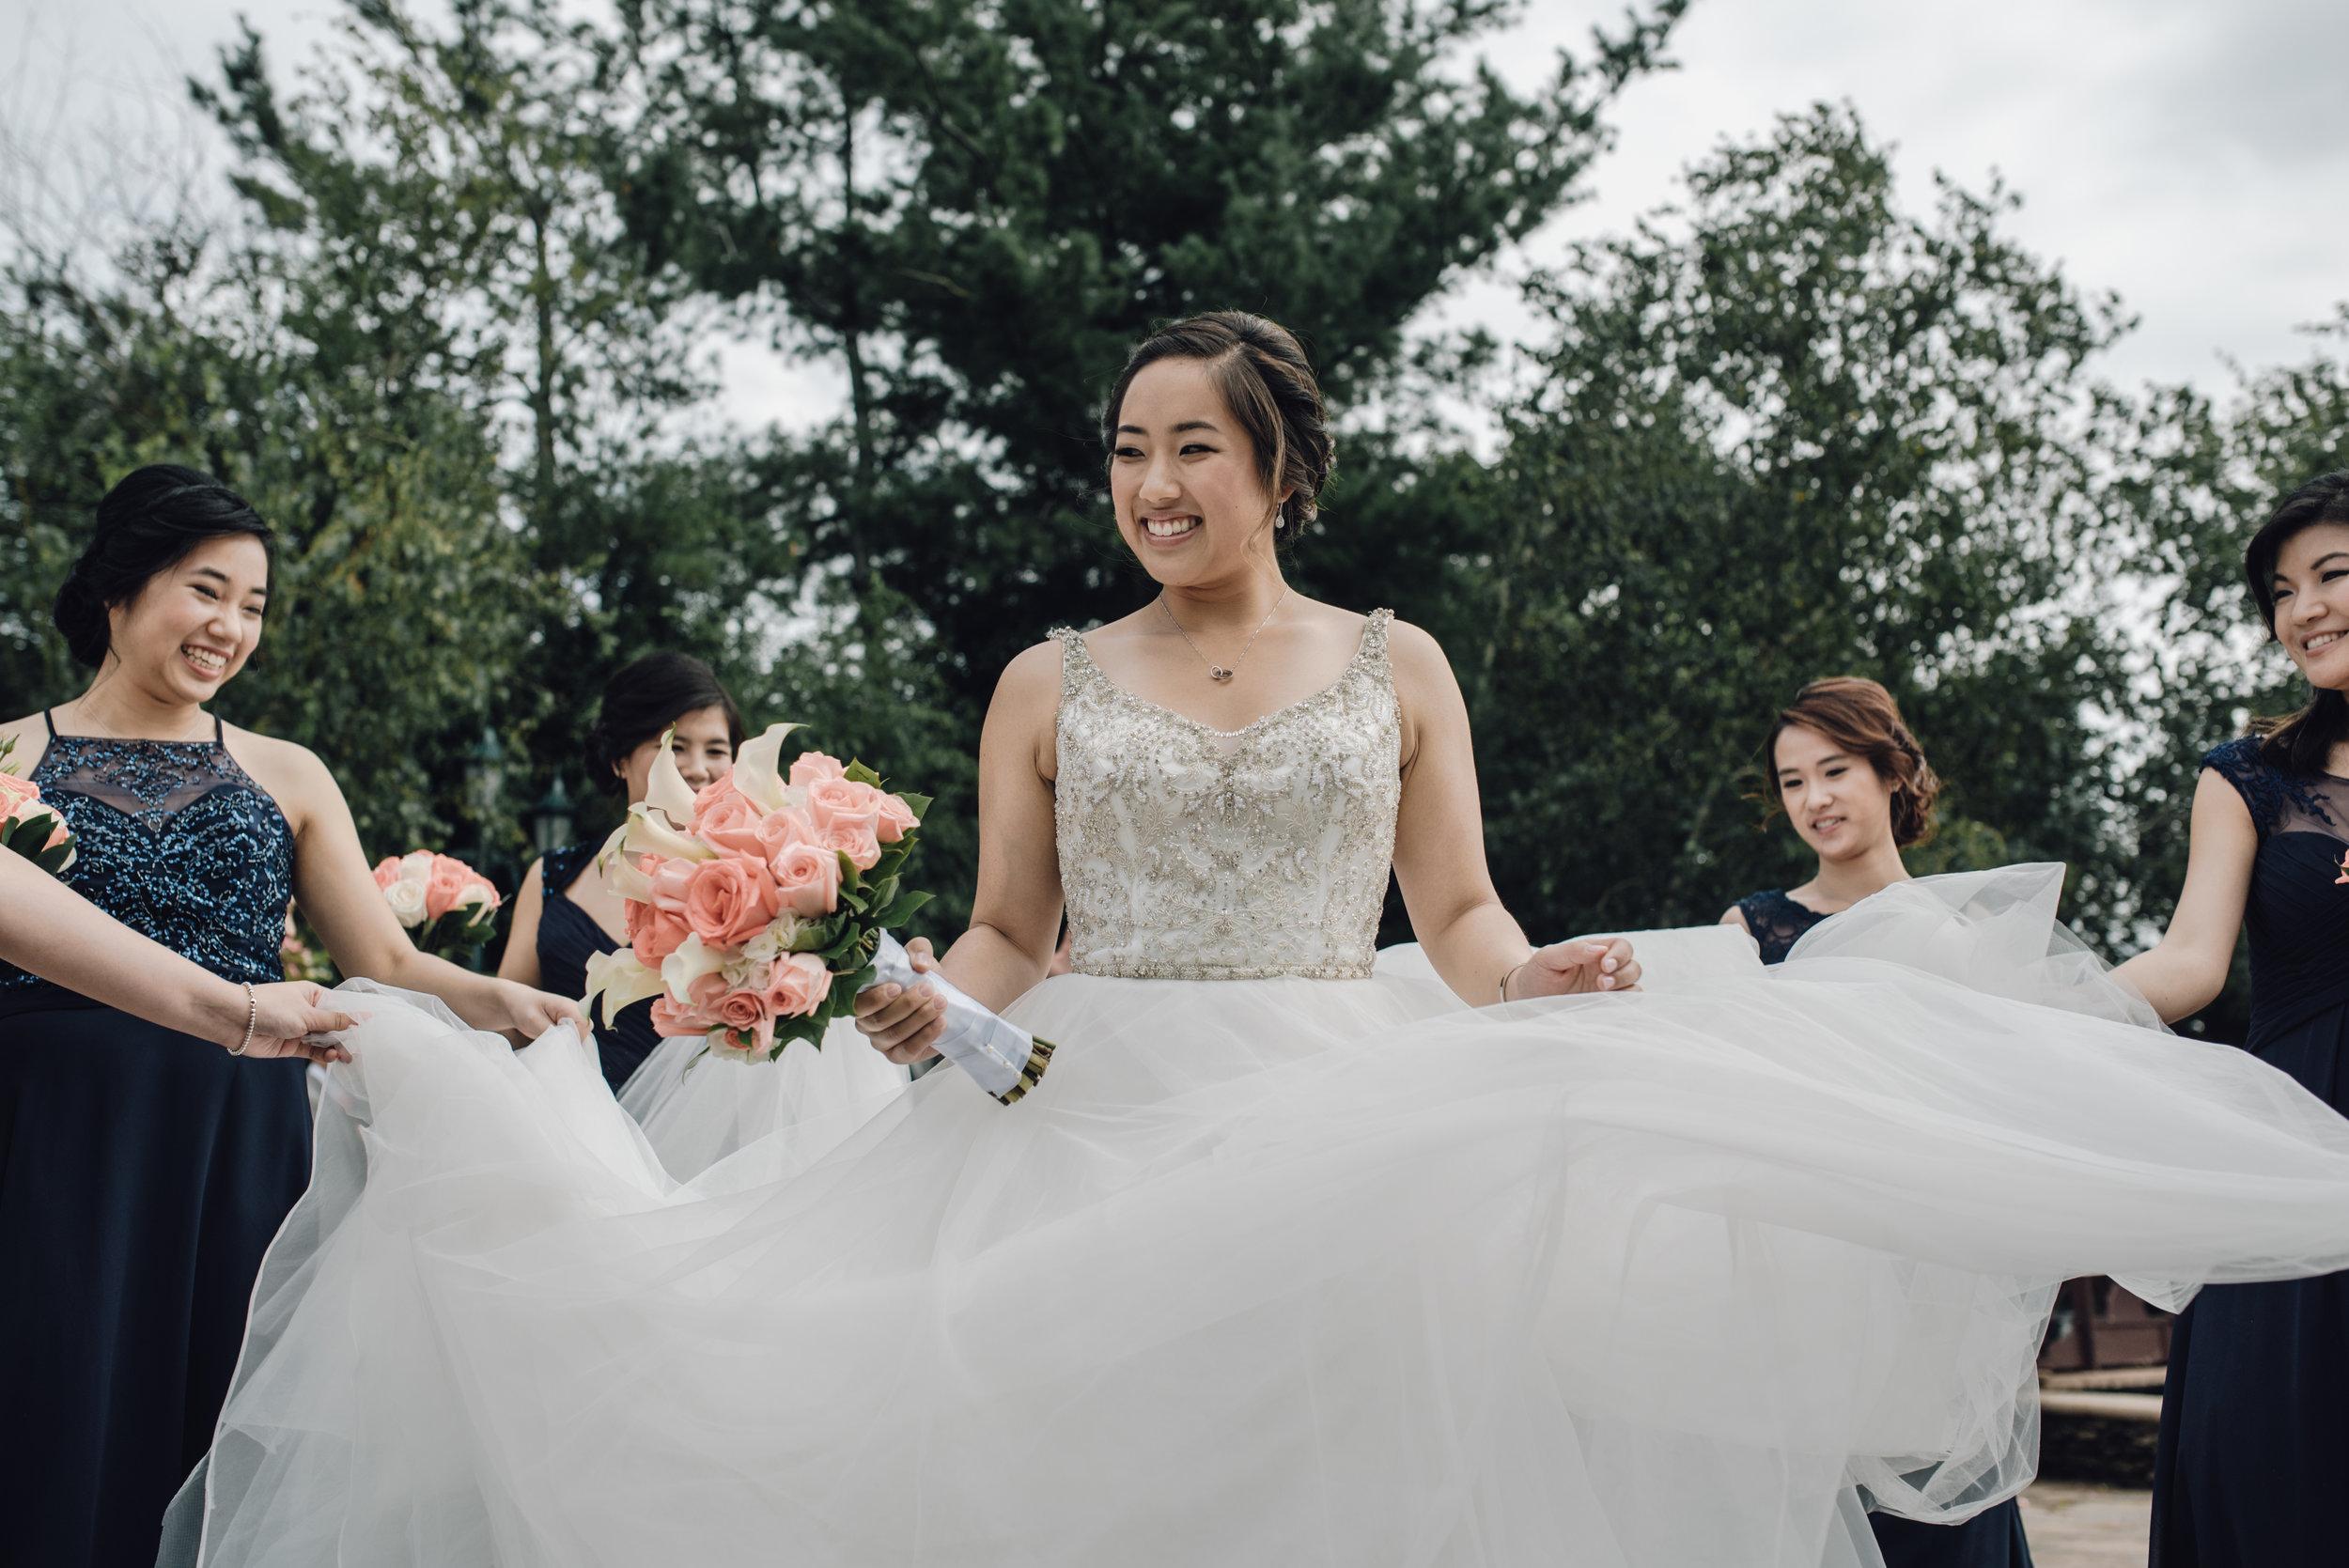 Main and Simple Photography_2017_Weddings_NewYork_TinaJon-760.jpg